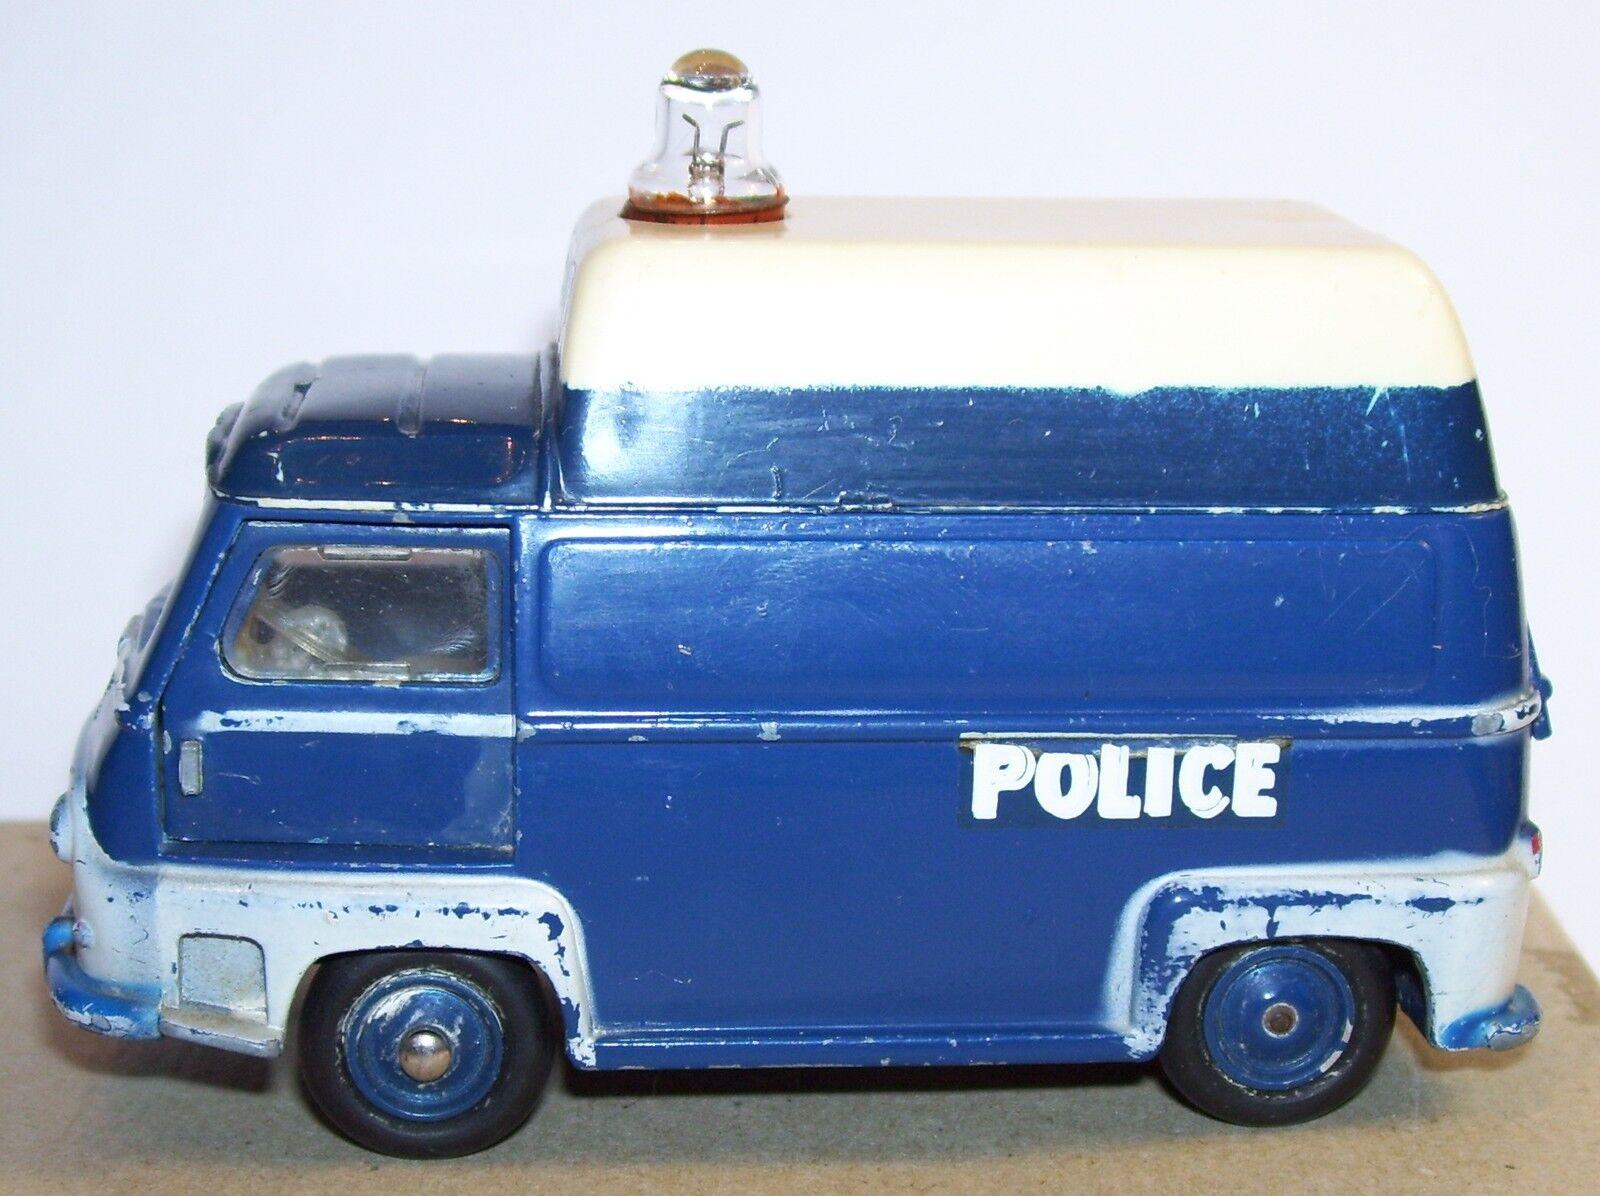 Rare made in france old cij renault runner police van 1962 ref 3.91 1 45